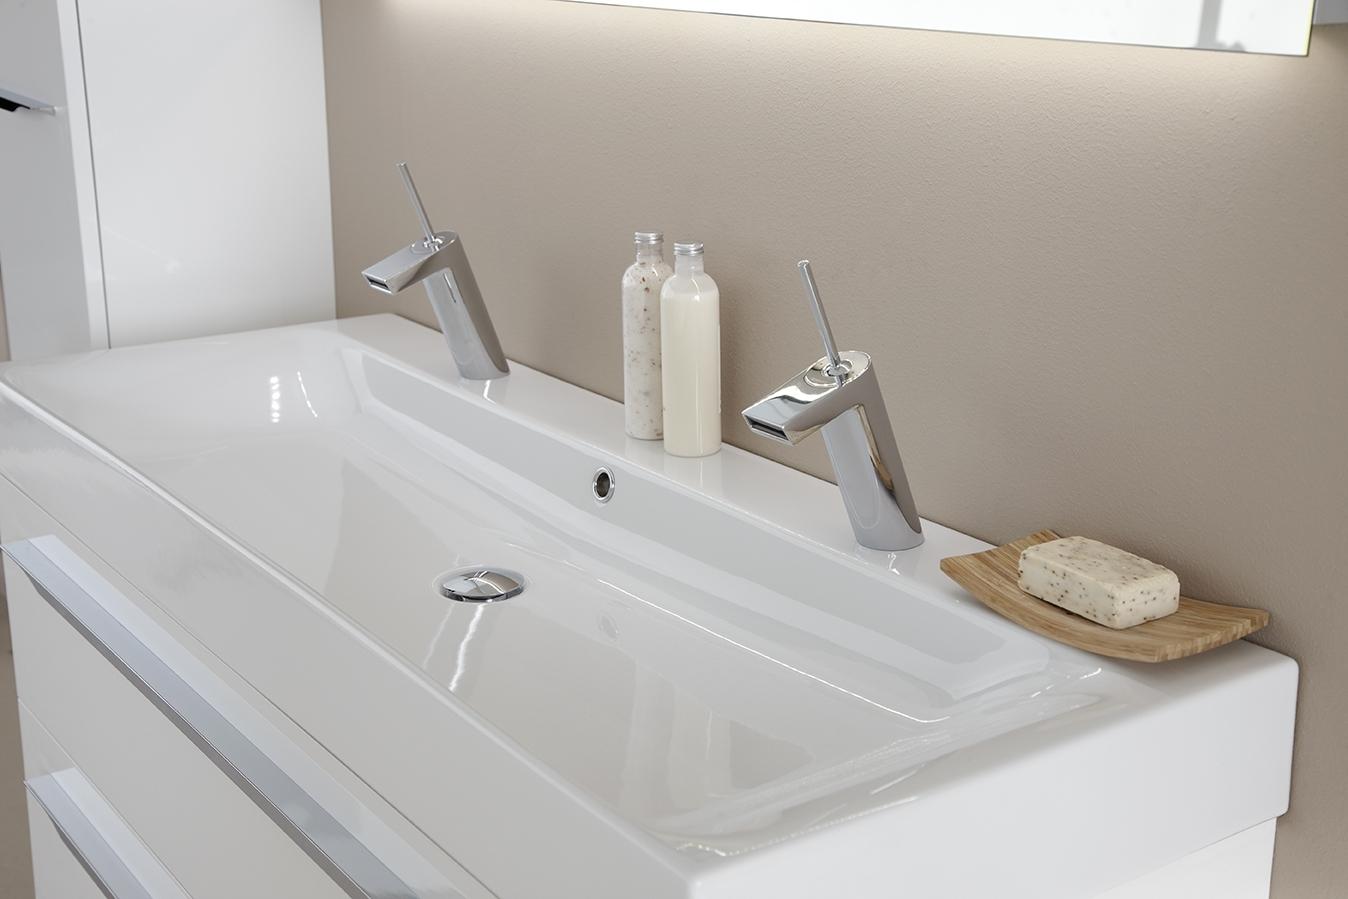 Ceramic line cm wastafel noa op wit hoogglans meubel